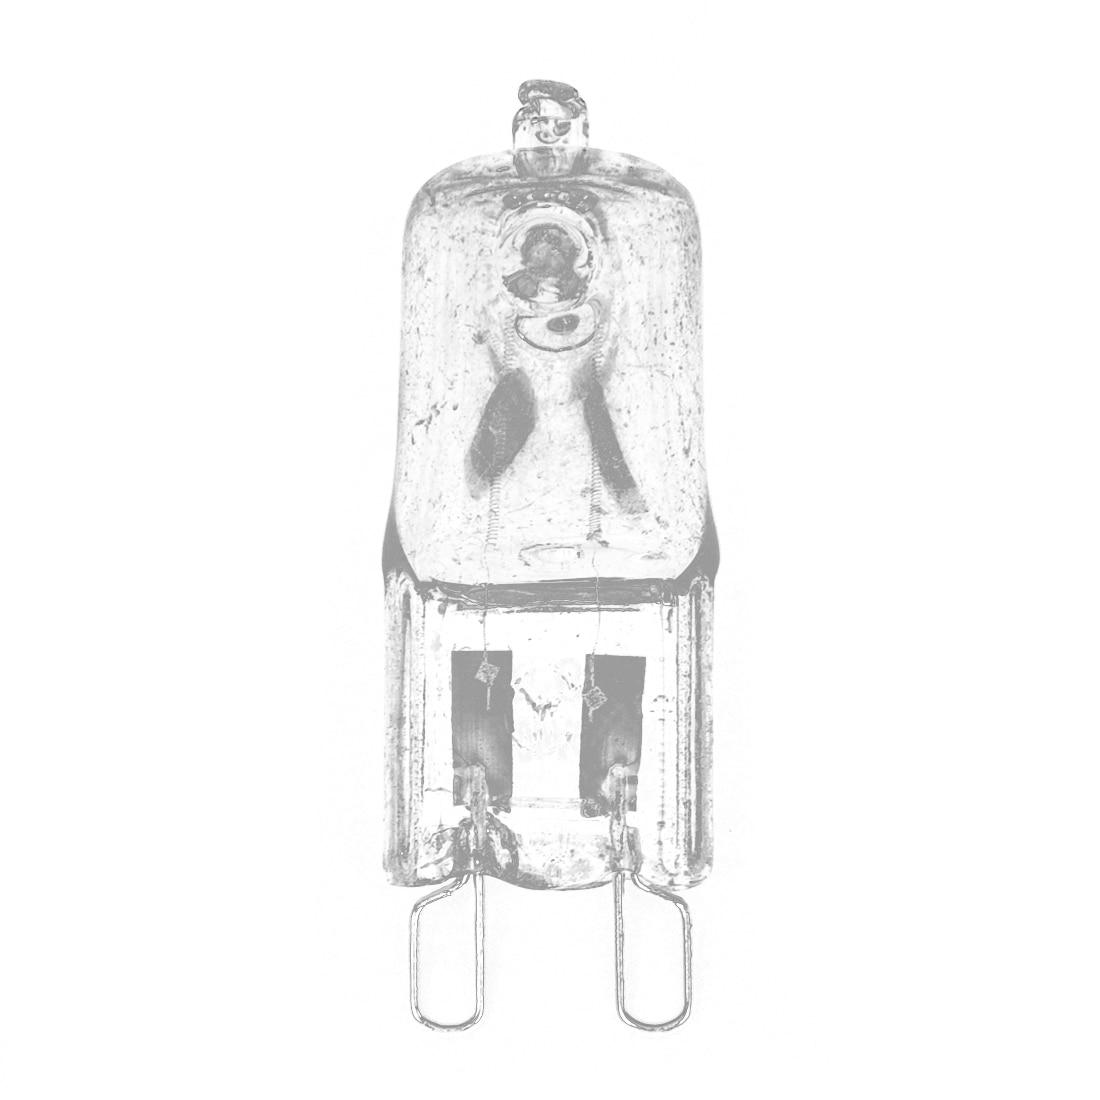 CNIM Hot 10 X Halogen Bulb Lamp G9 230V 40W Warm White For House